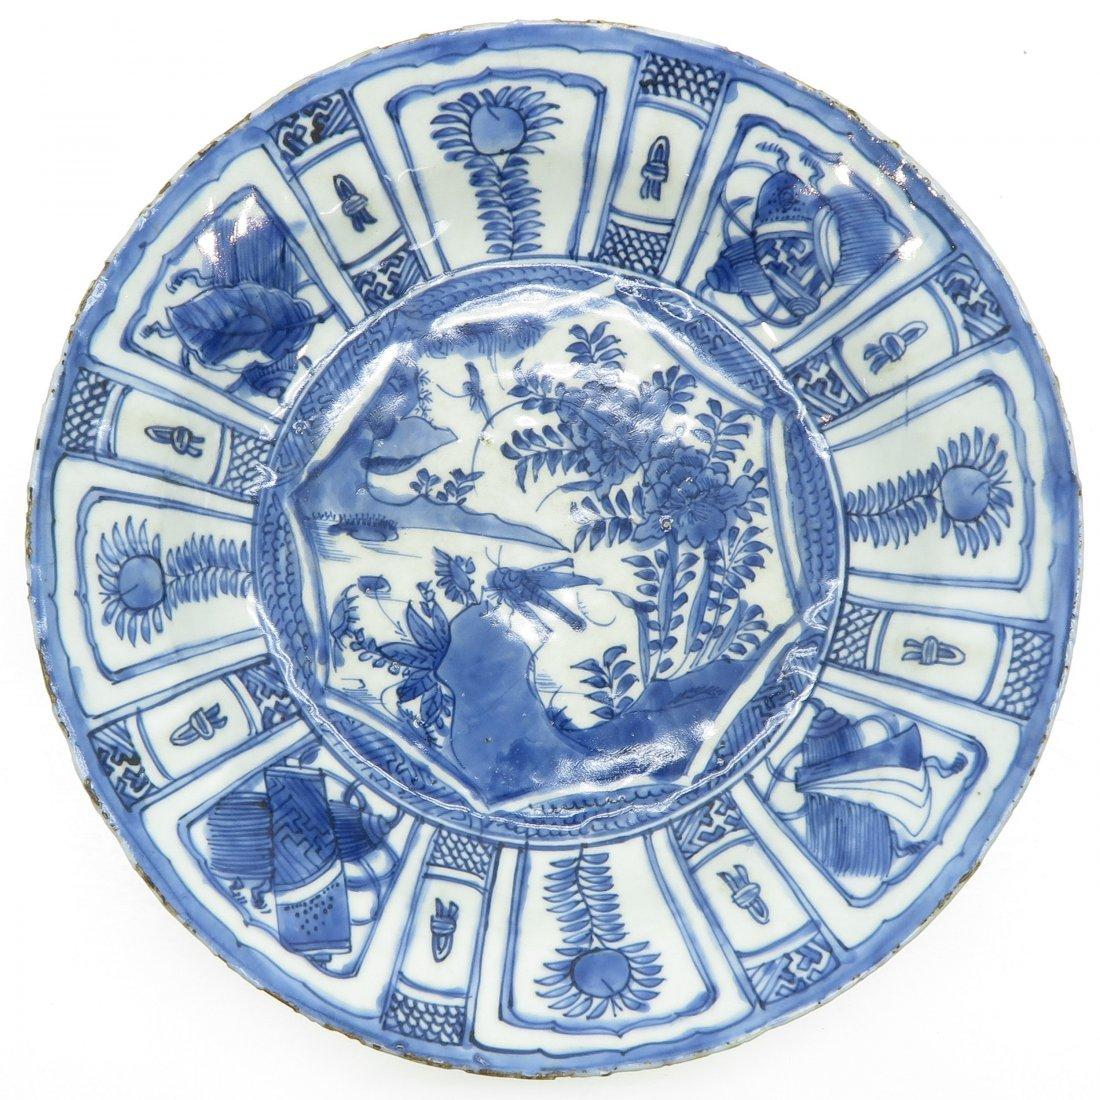 China Porcelain Wanli Period Plate